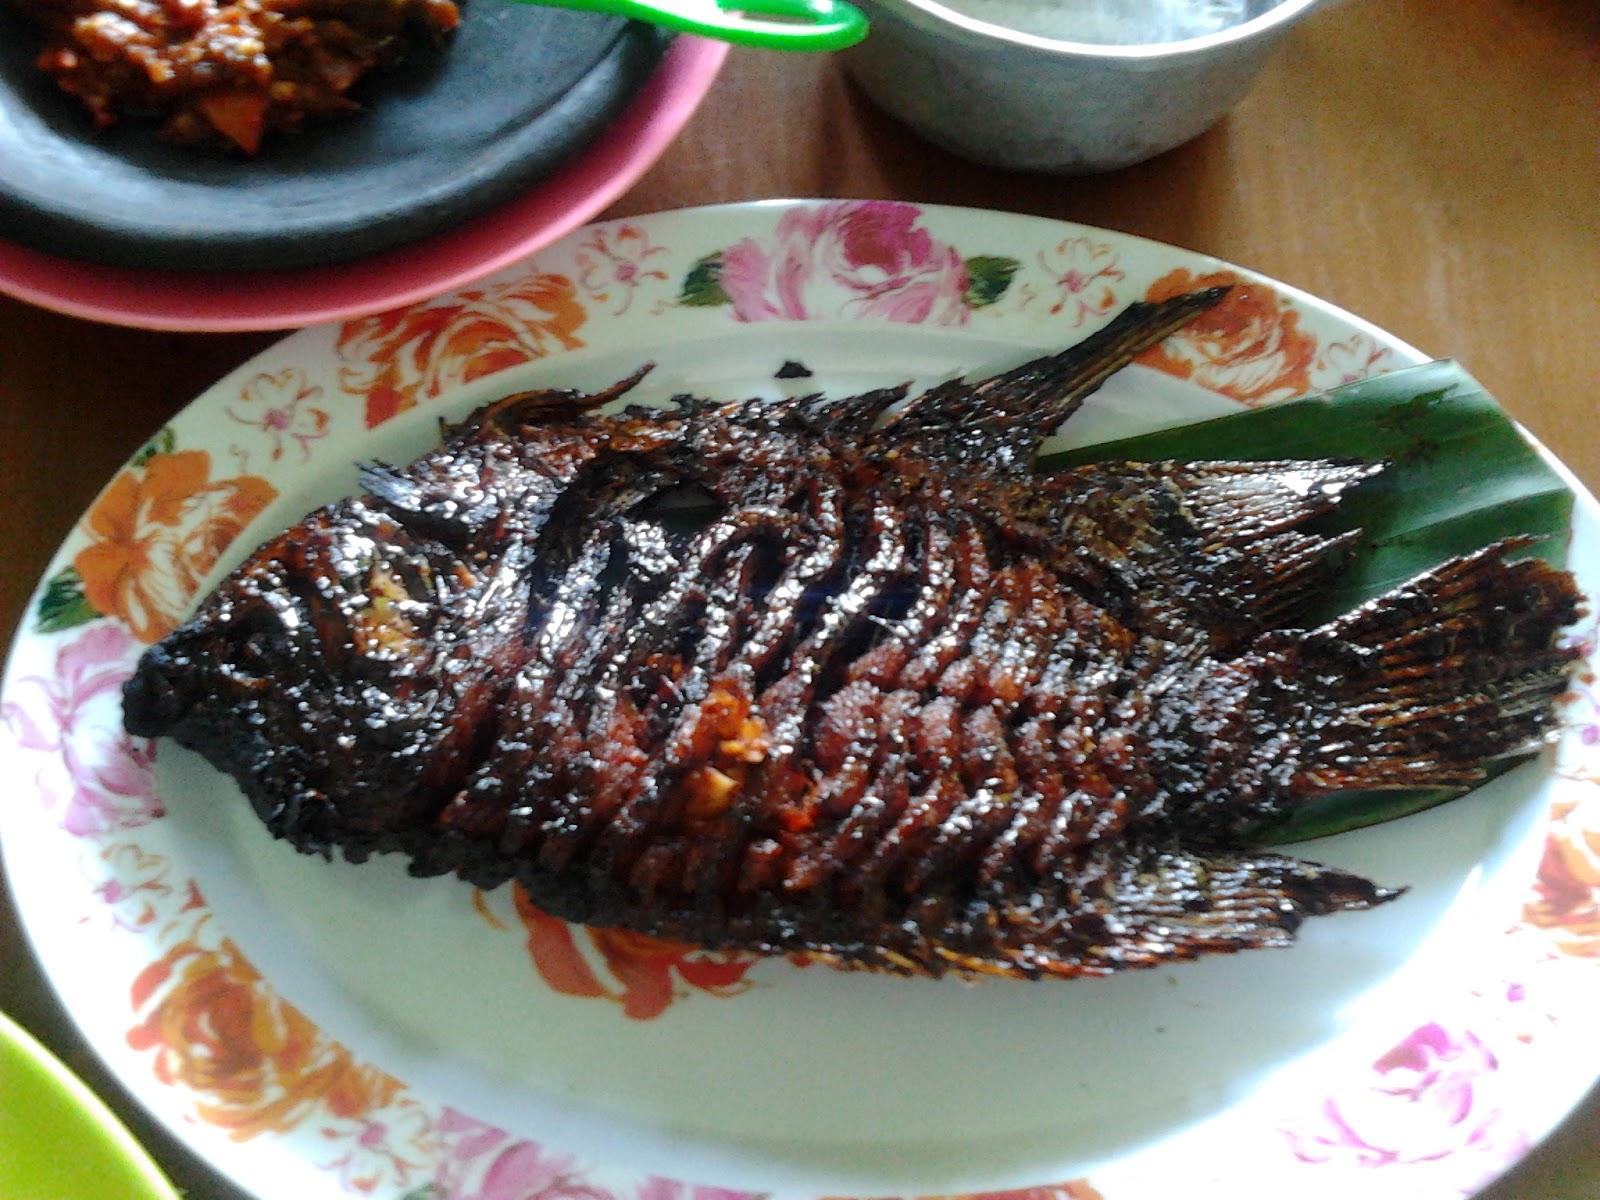 Rumah Makan Suminar Magetan Kolam Renang Tirta Naga Sari Kab